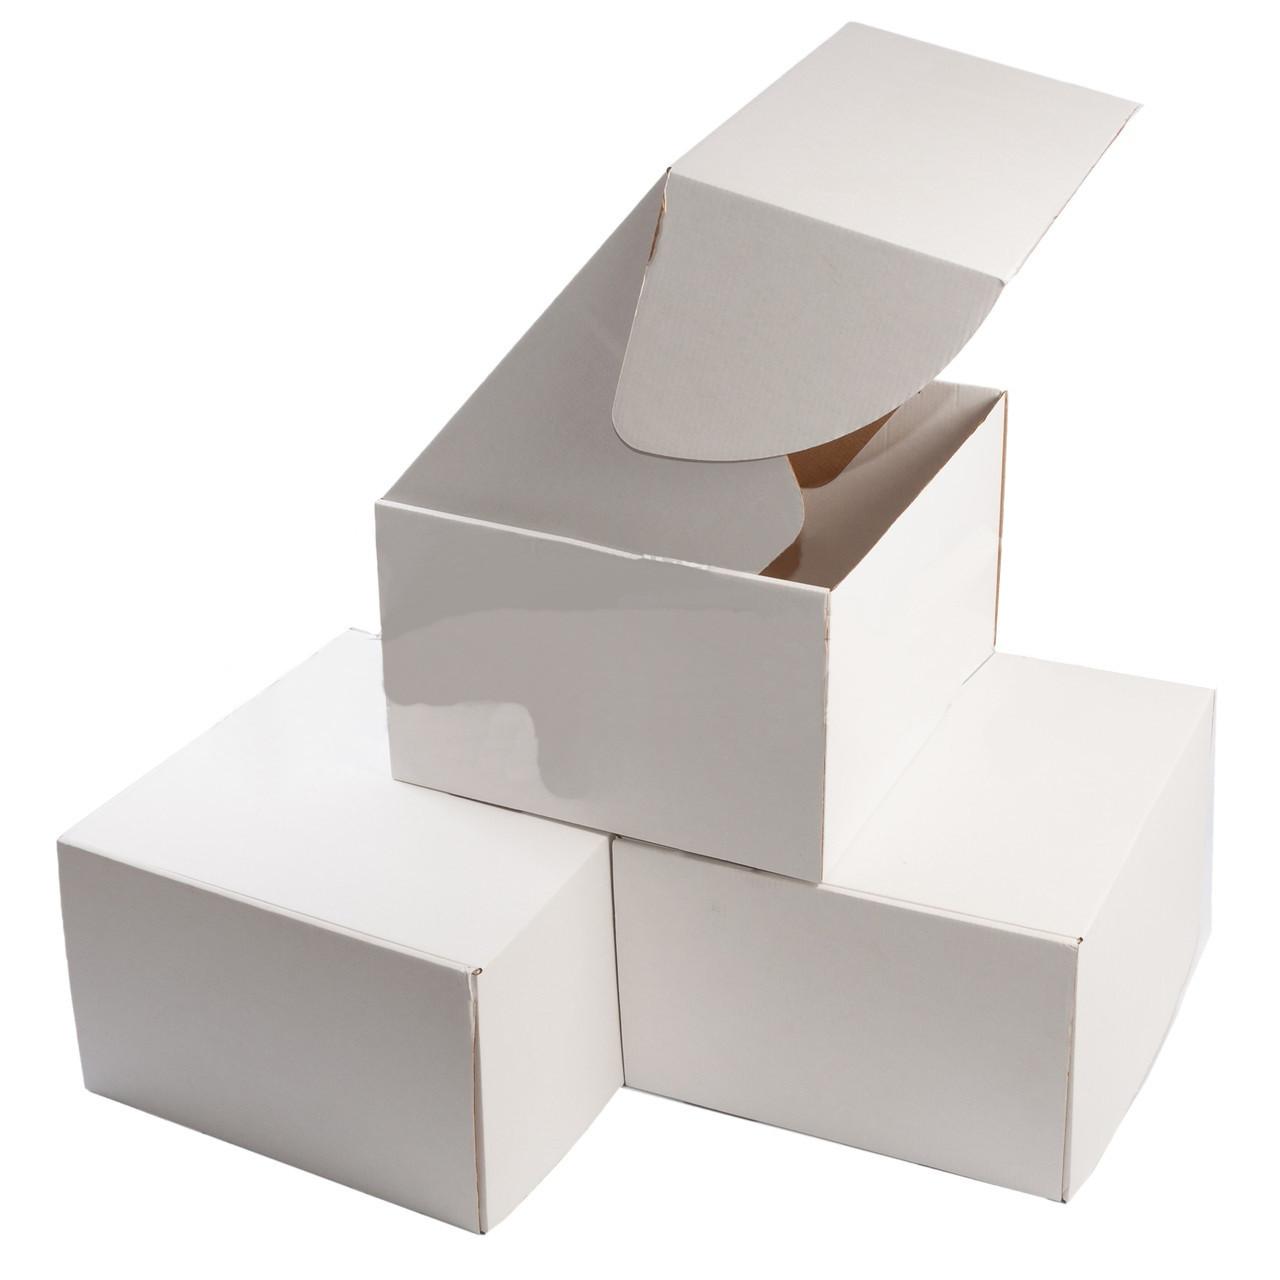 Картонная упаковка 270х220х110, мм. белая